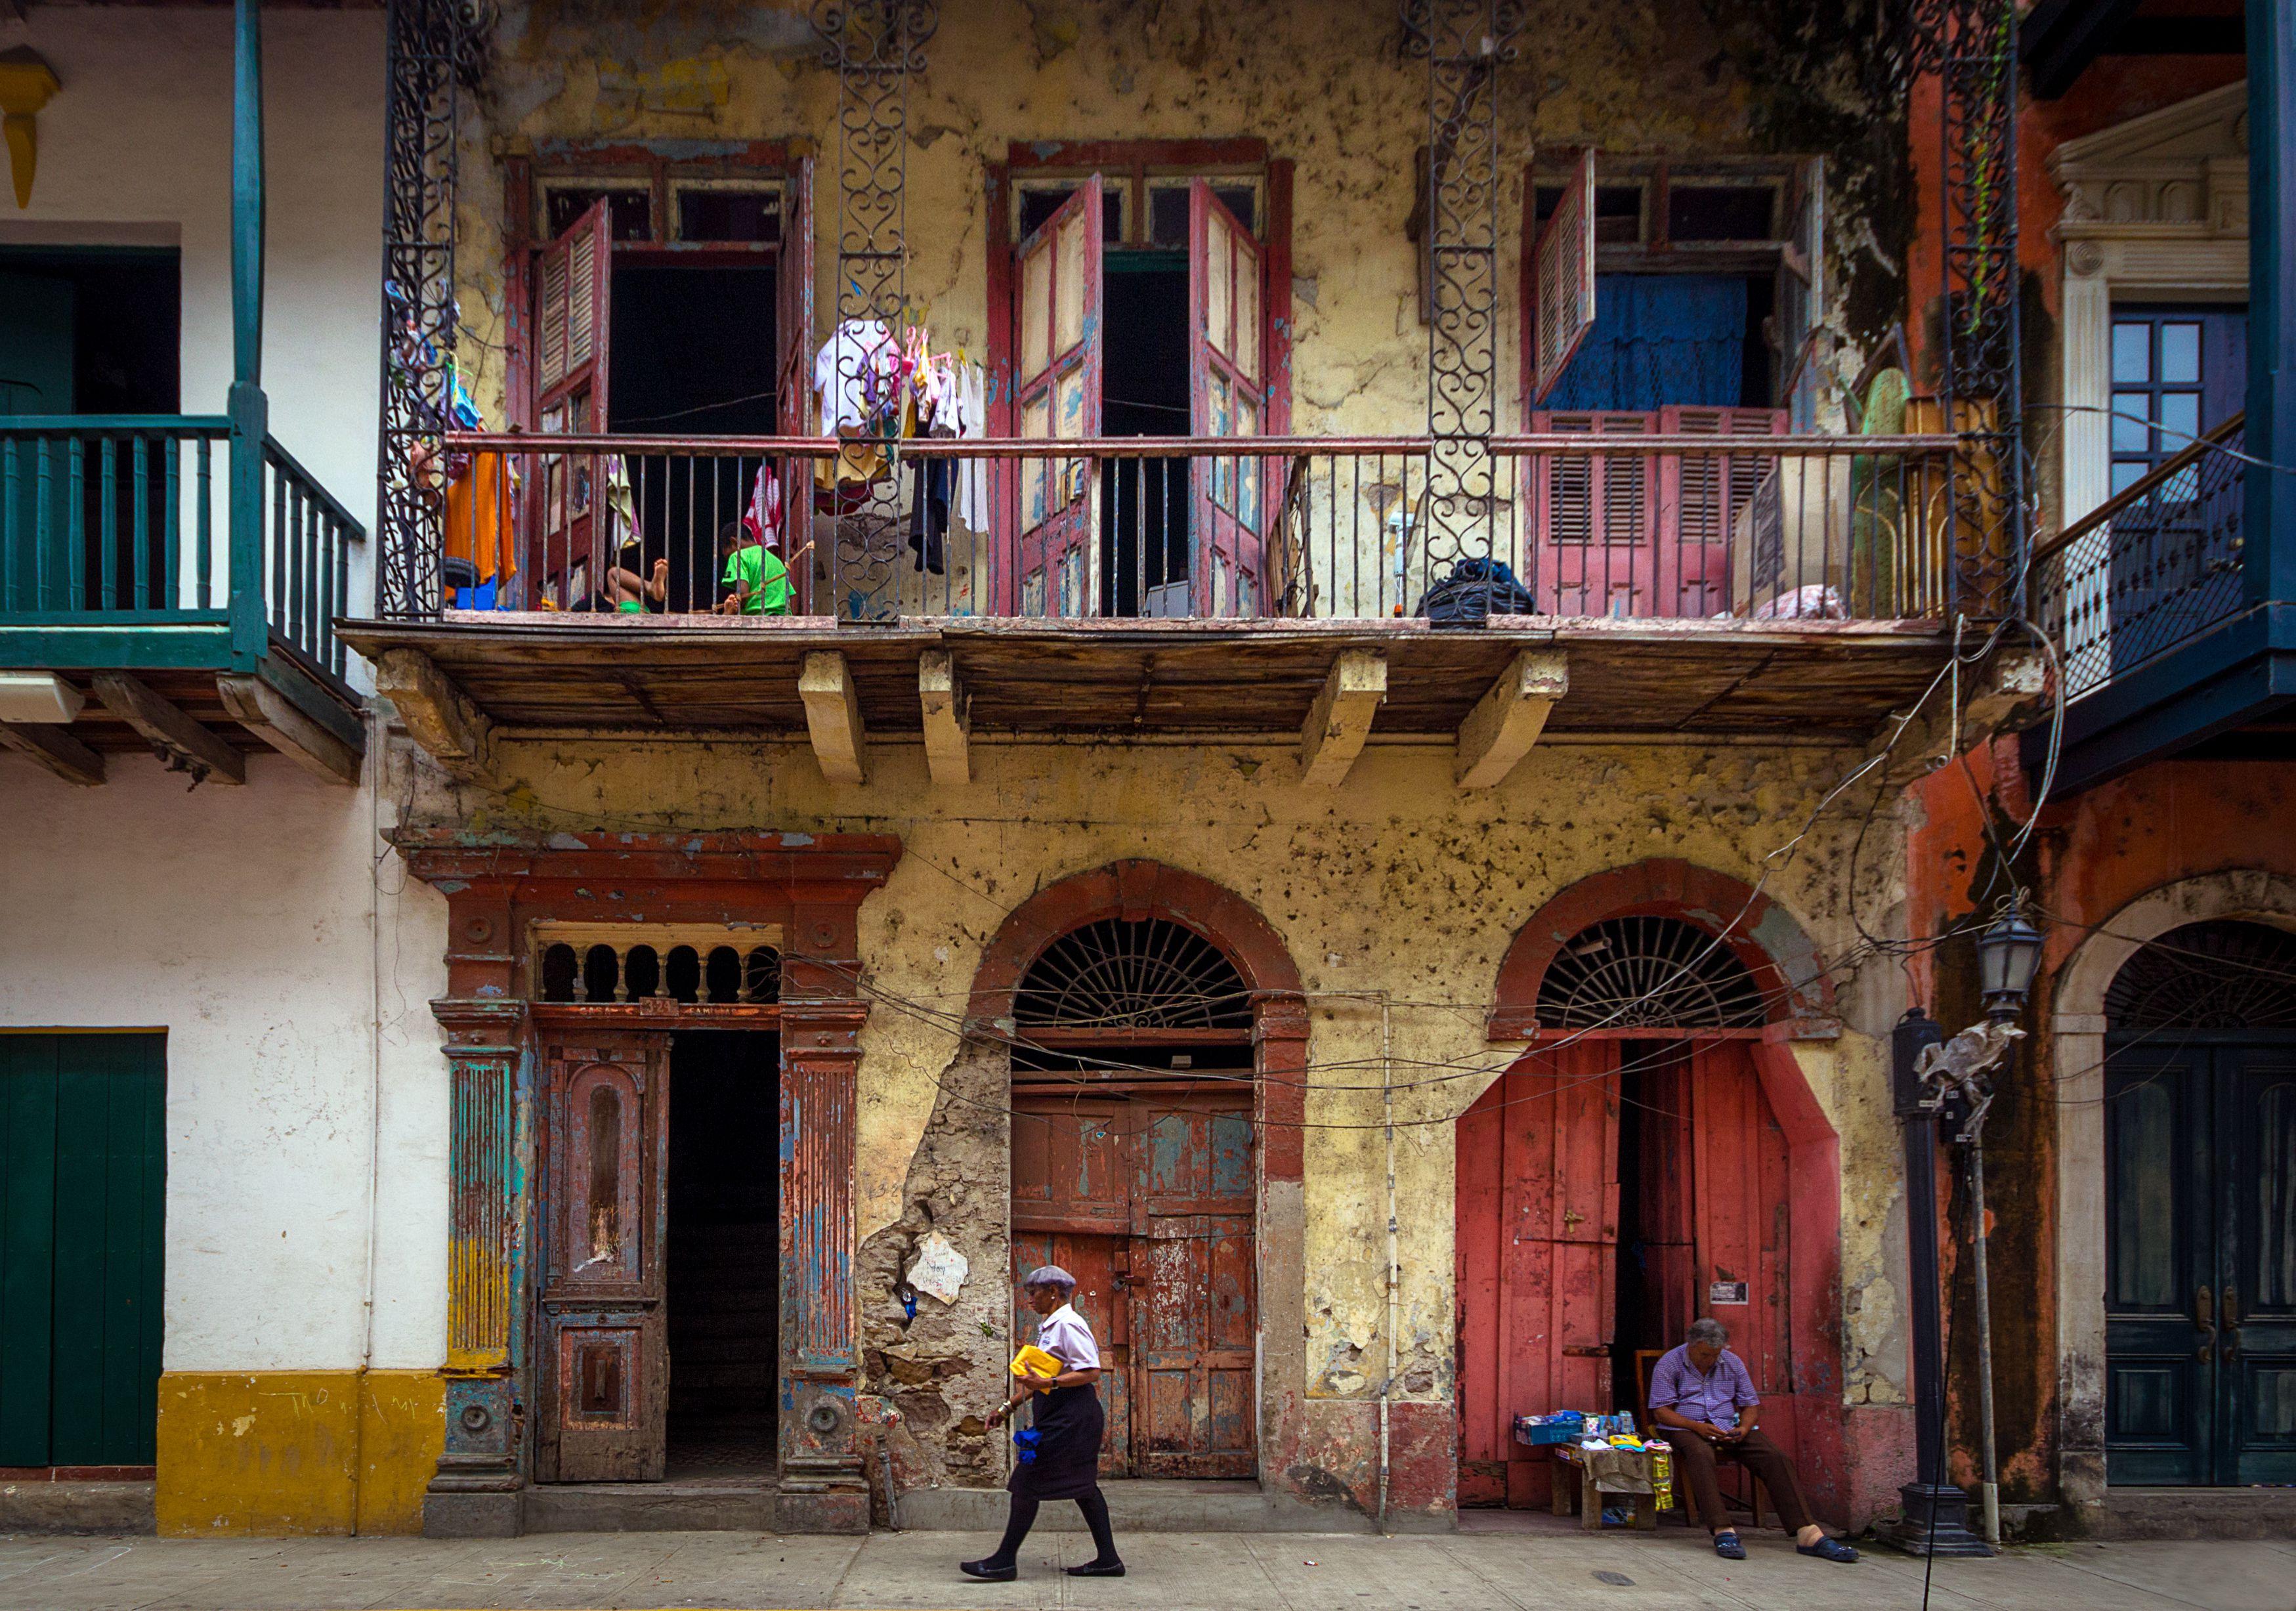 Affordable Auto Insurance >> 8 Tips for Visiting Panama City, Panama